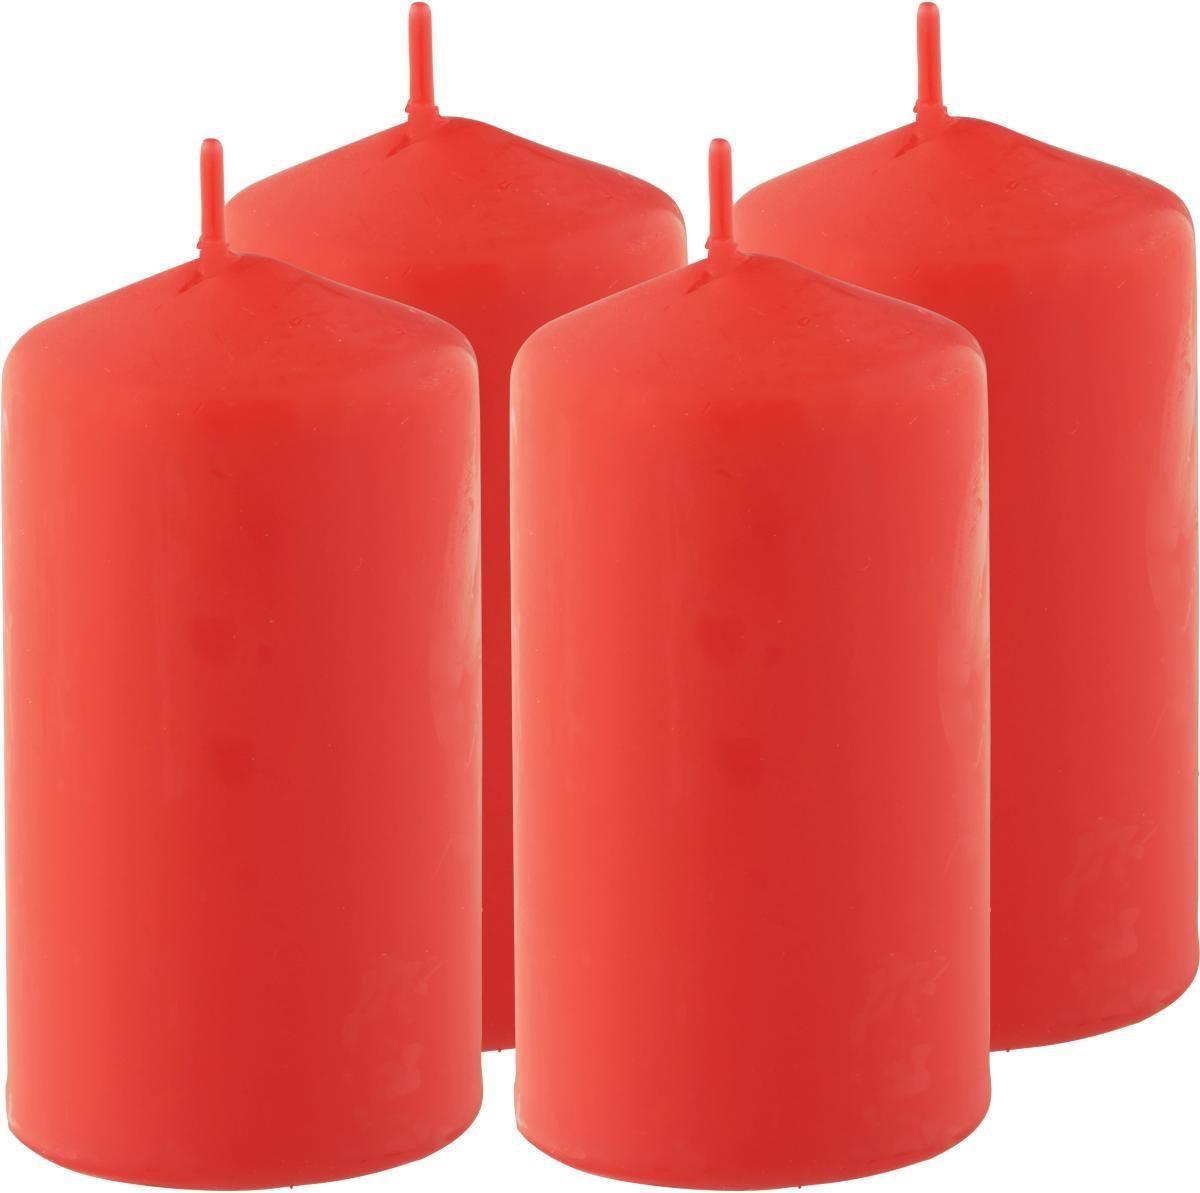 Stumpenkerzen Katrinja in mehreren Farben - Türkis/Rot (5/10cm) - MÖMAX modern living